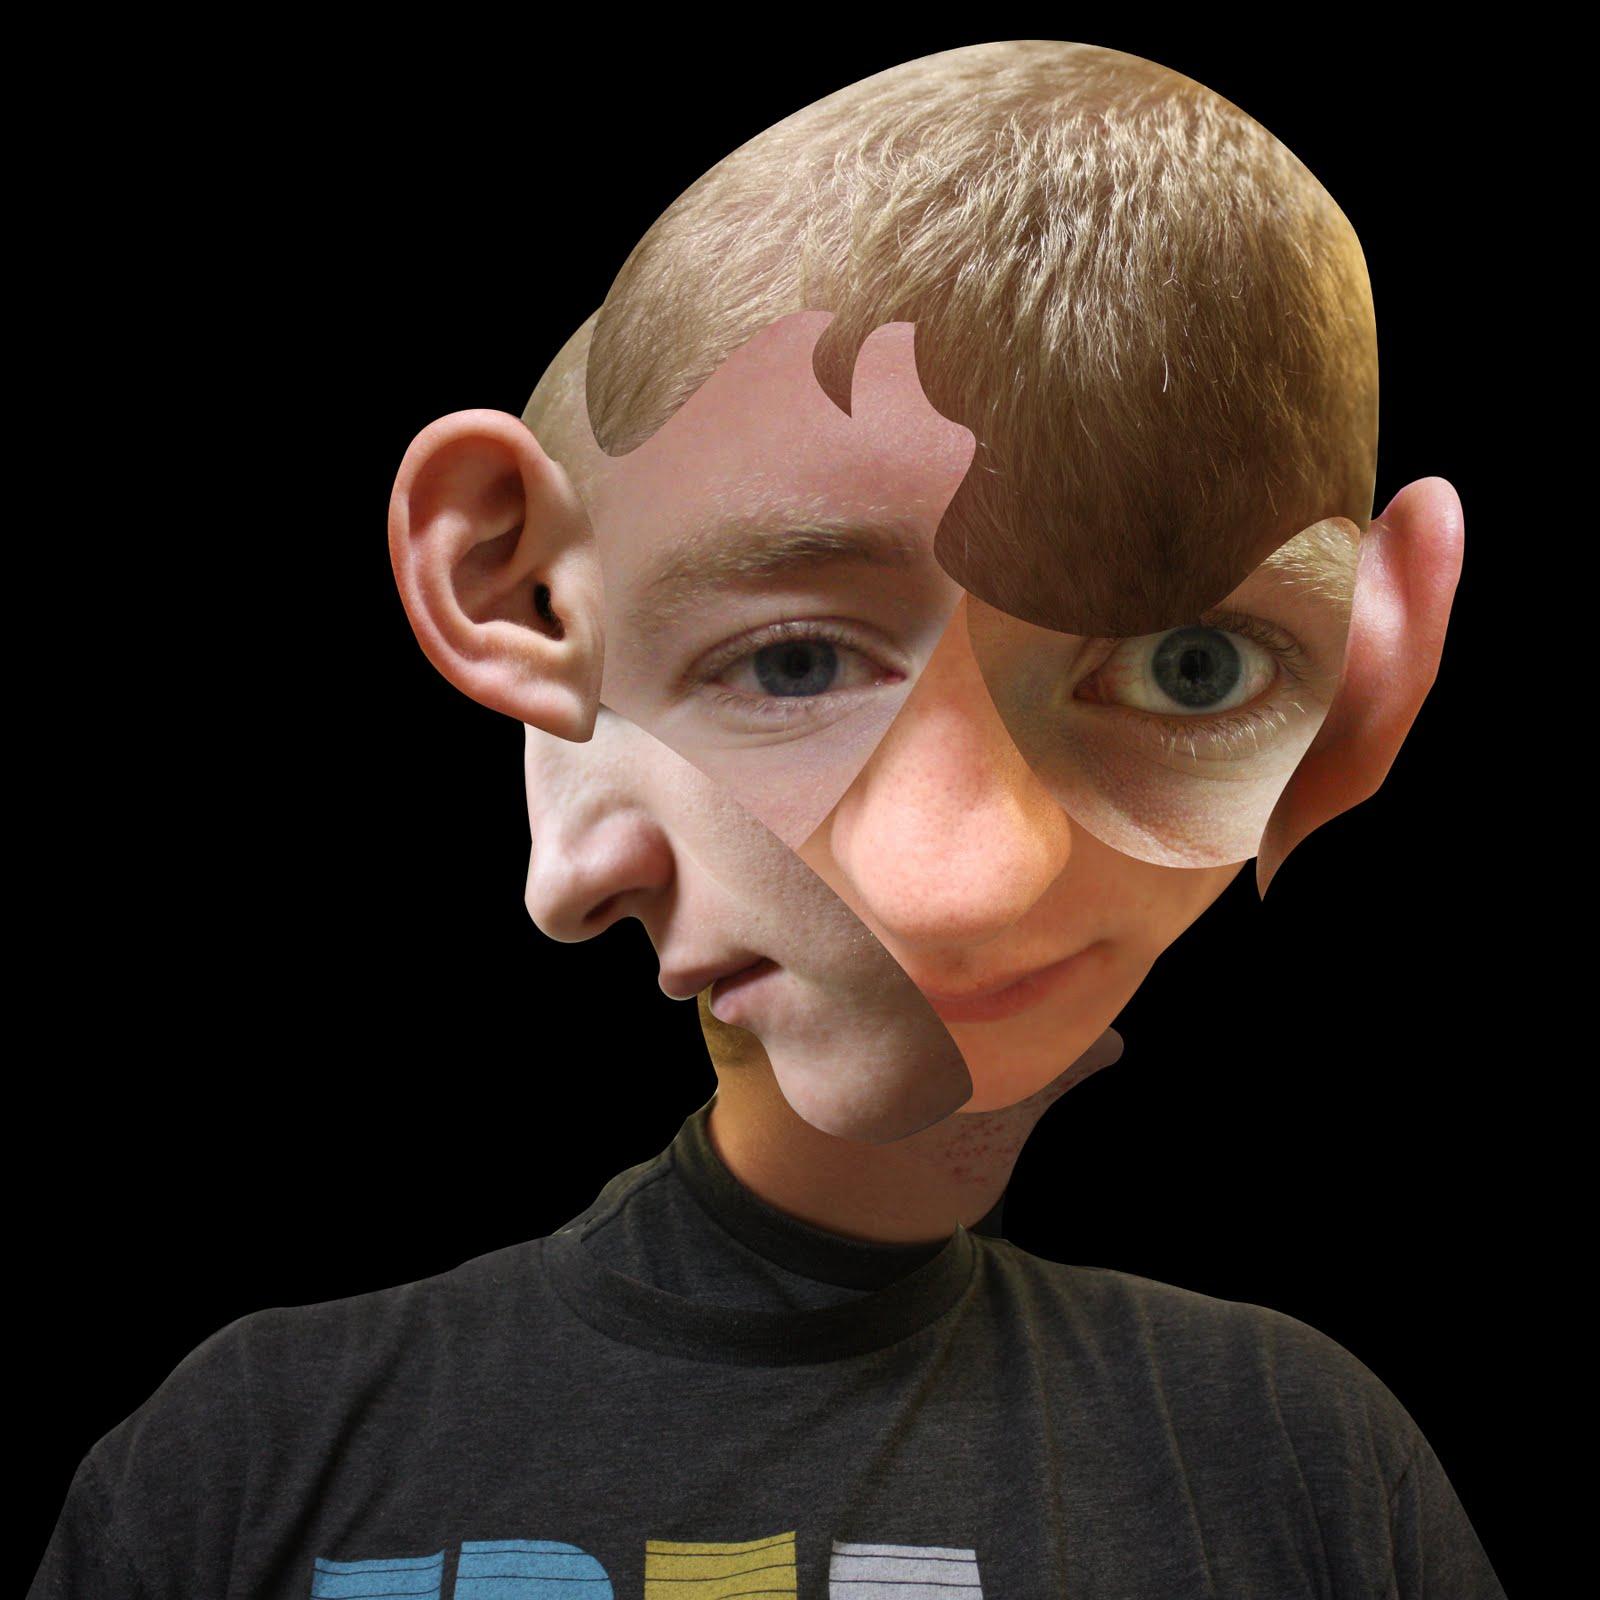 des his f jeff analytical cubist self portrait analytical cubist self portrait